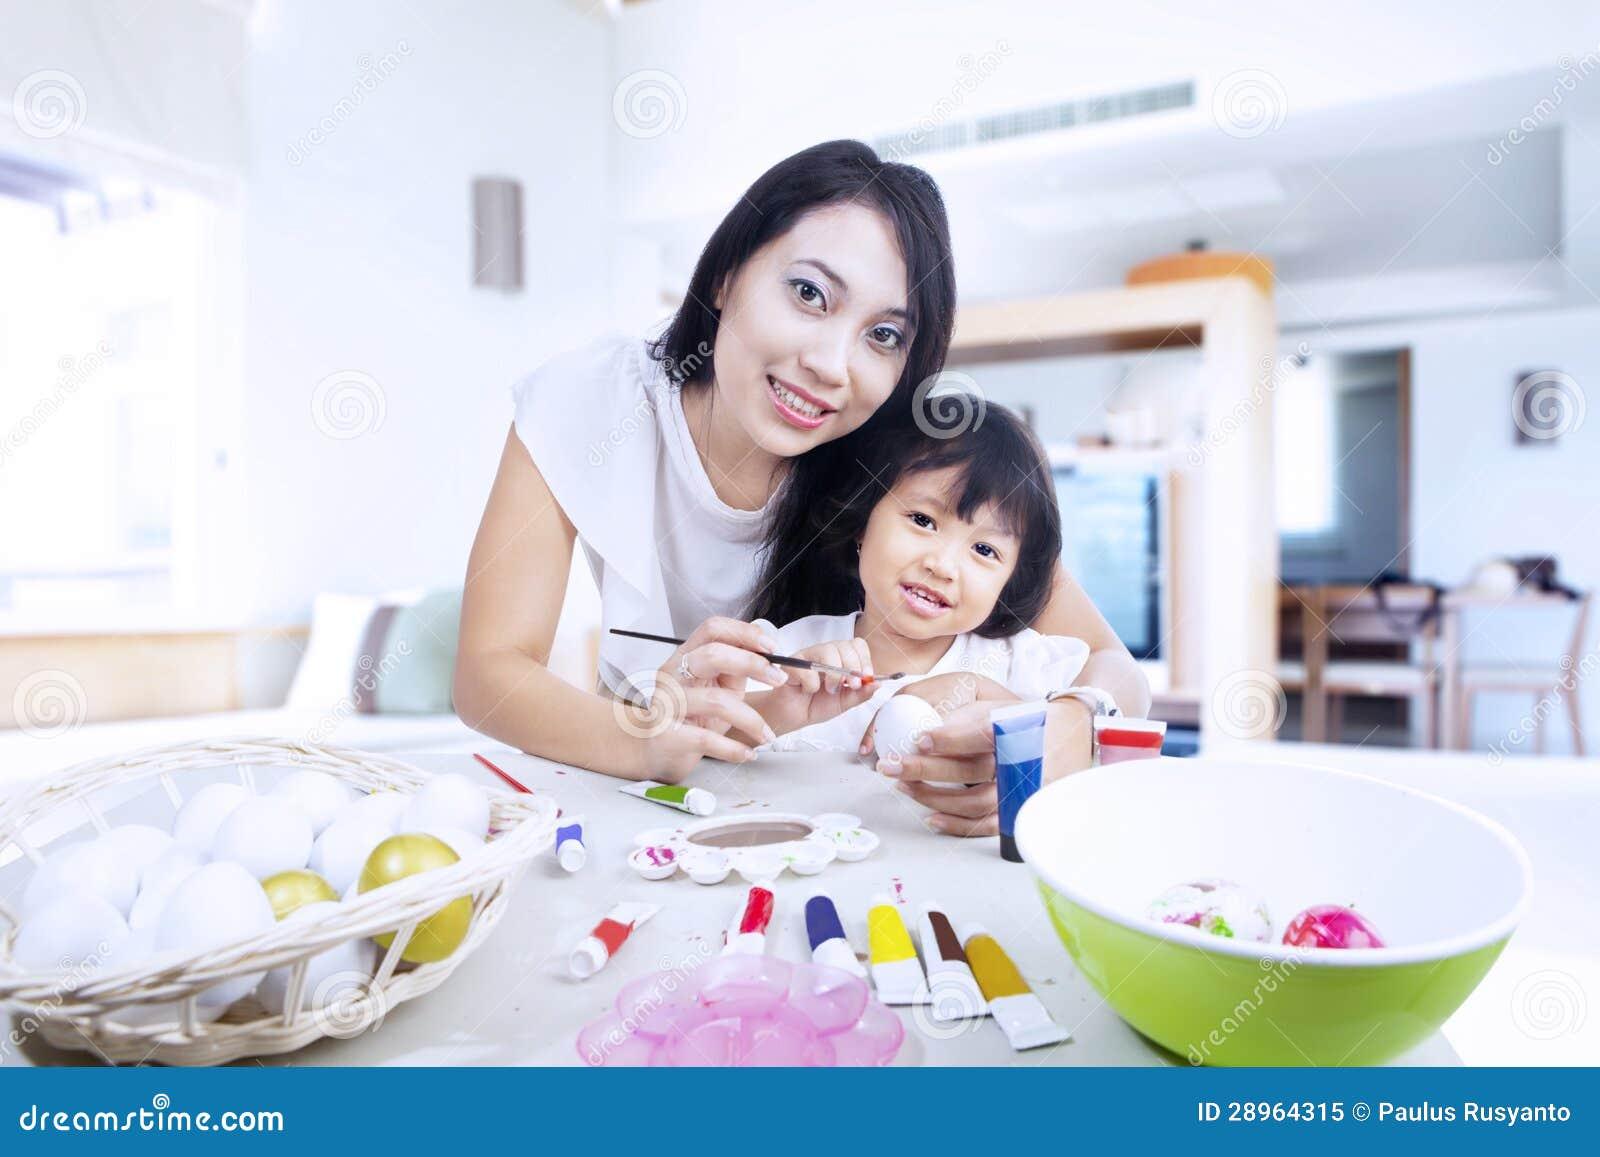 Matka i córka malujemy Easter jajka w domu